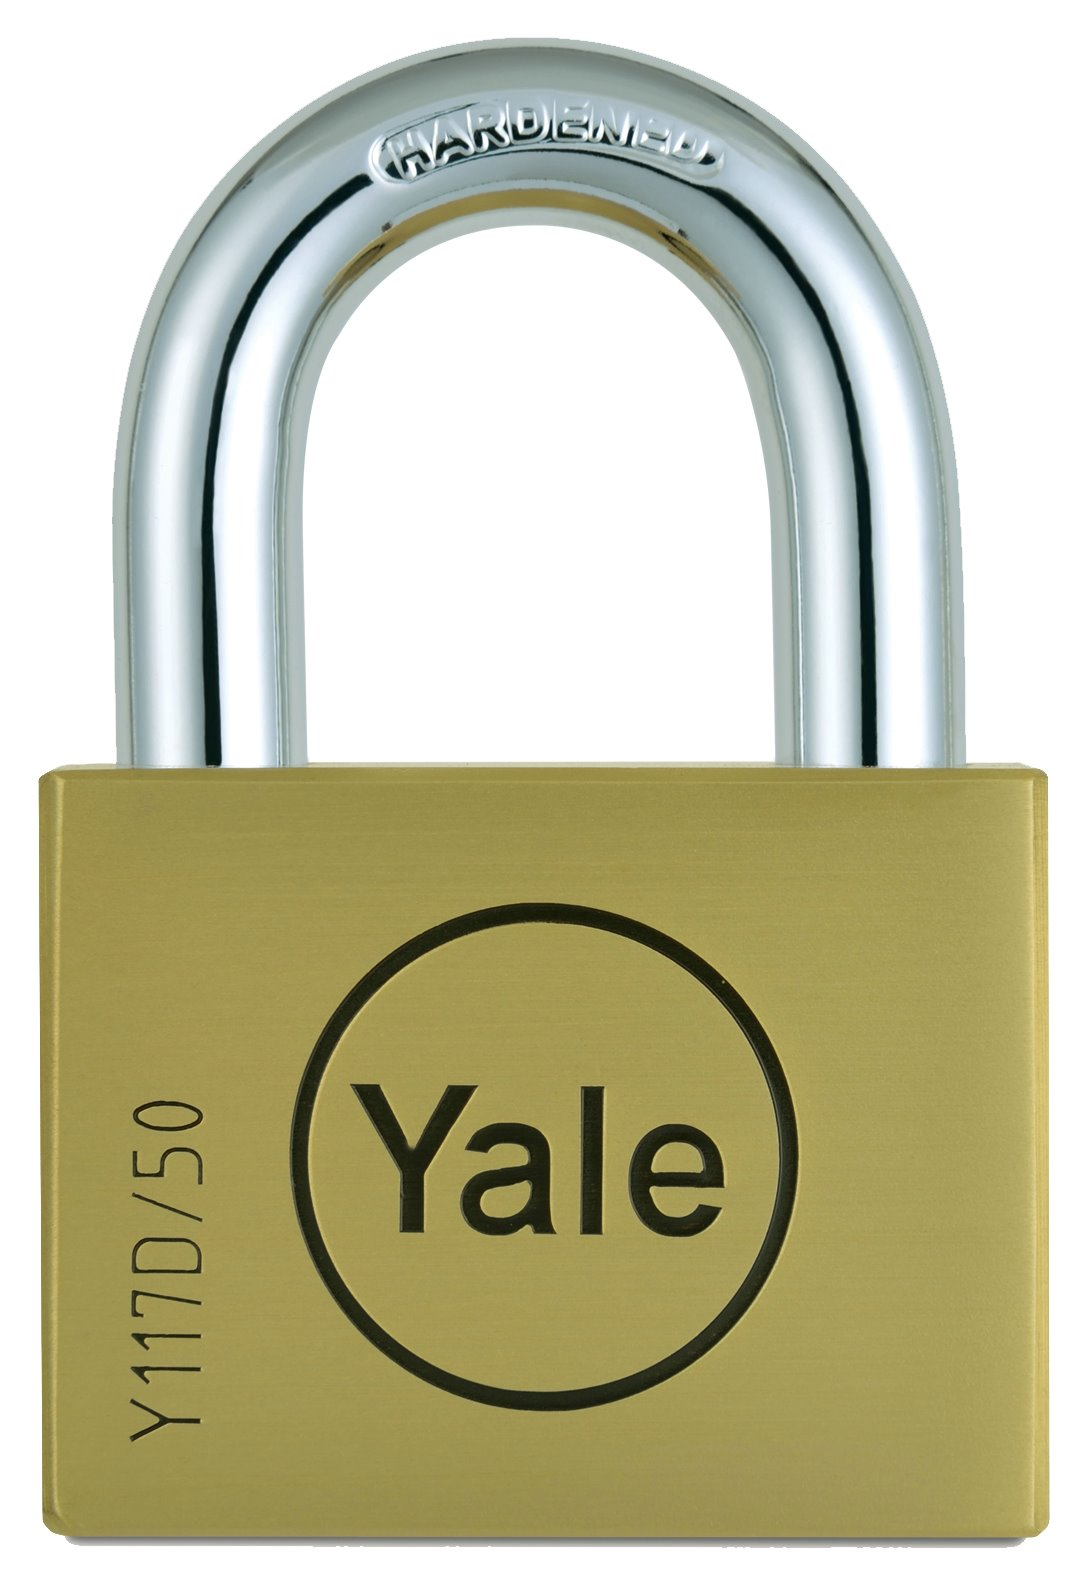 Y117D/50/127 - Yale Disc Padlock 50mm